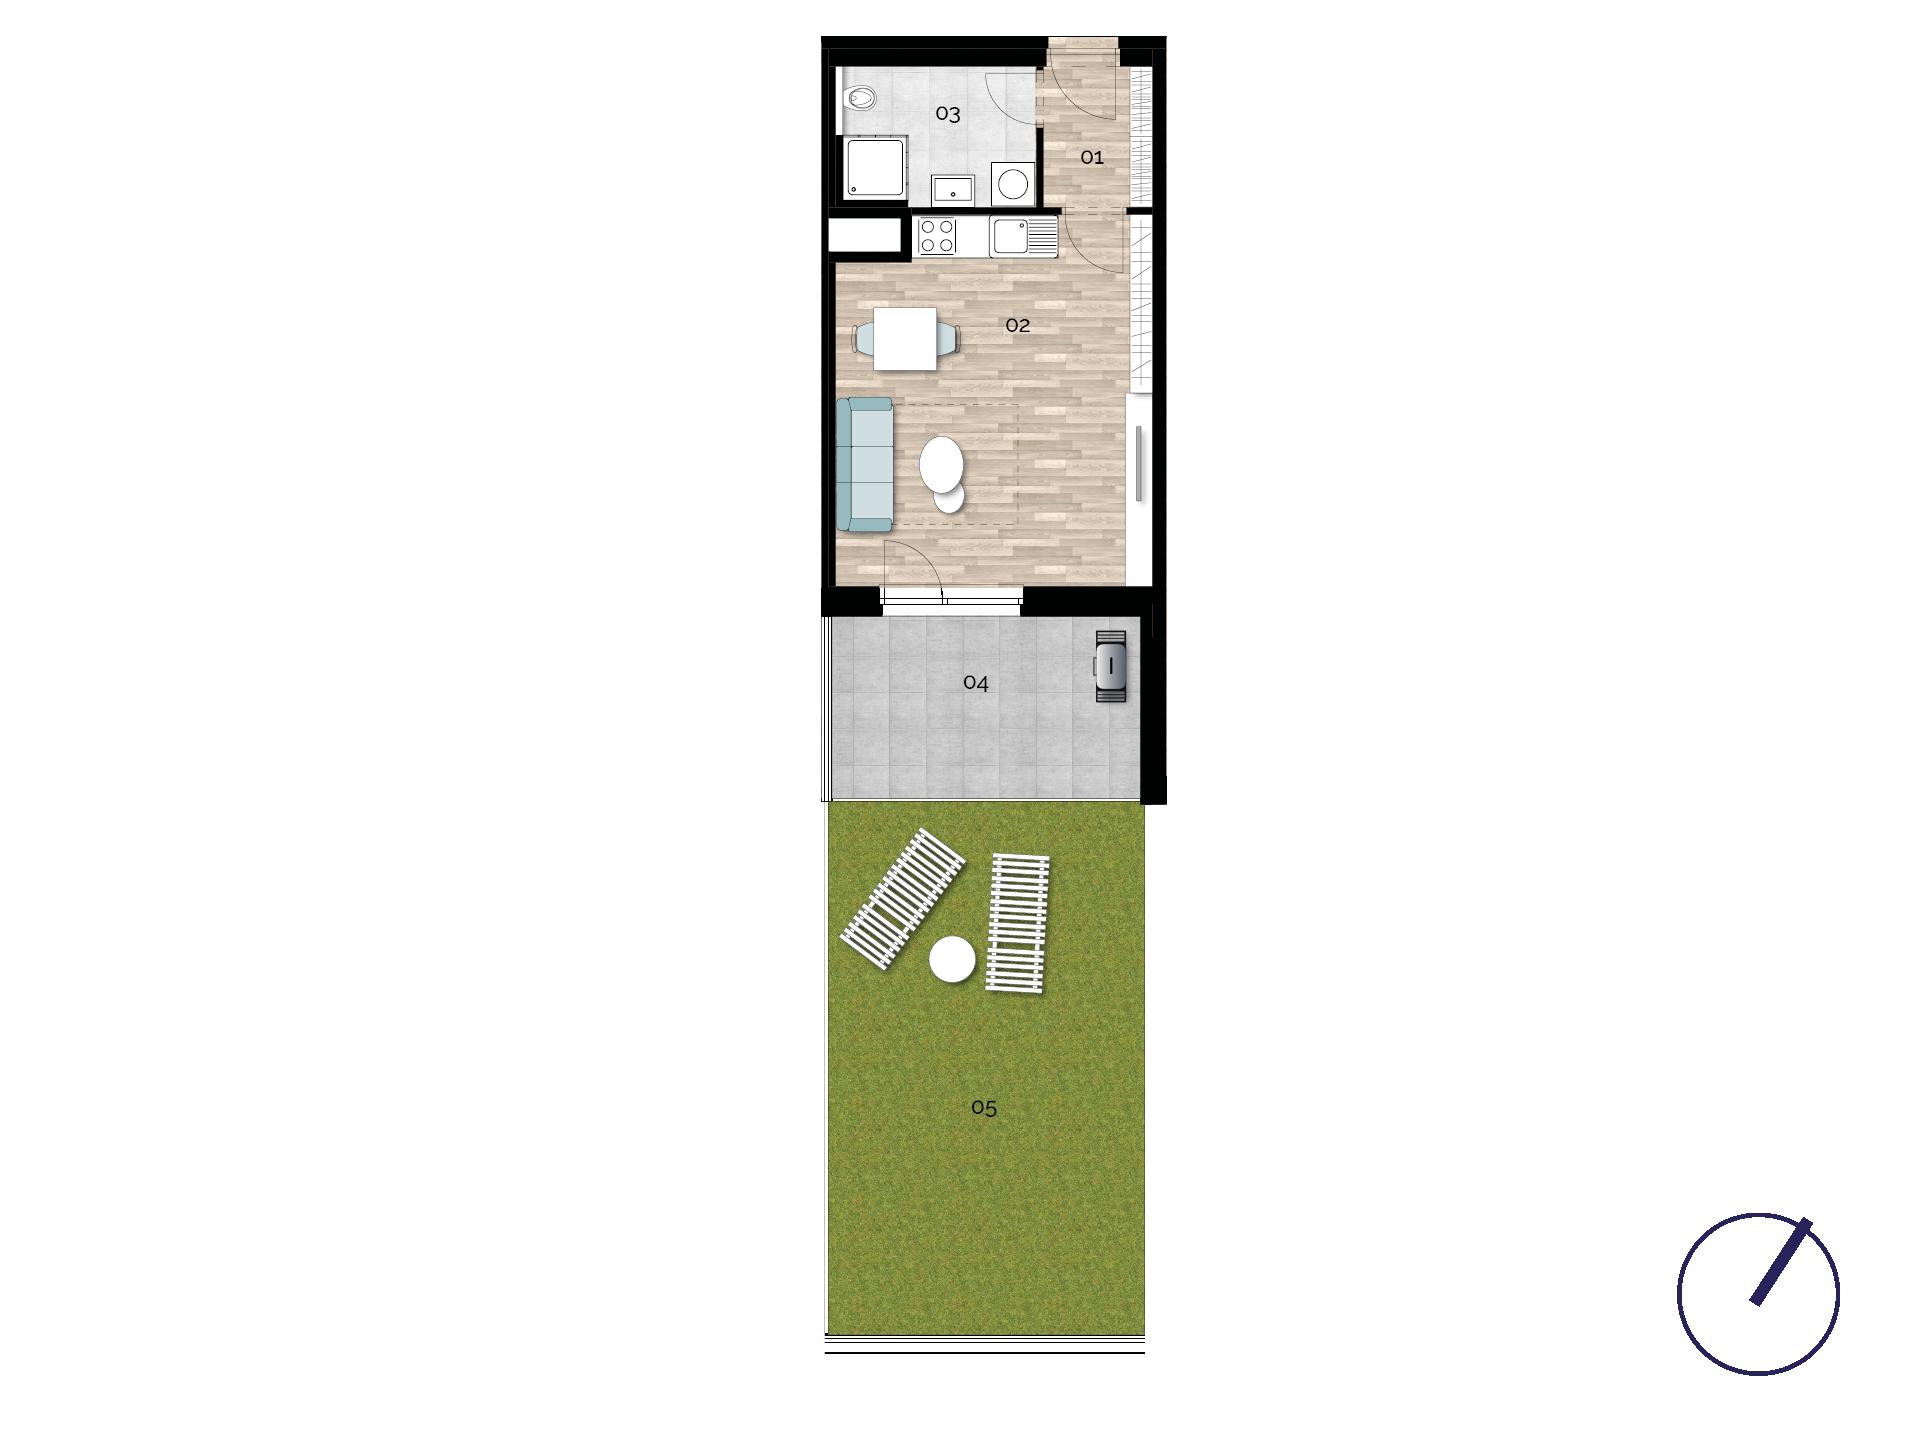 Detail Nemovitosti - Rezidence U Rokytky, Praha 9 1C1 / 1. NP